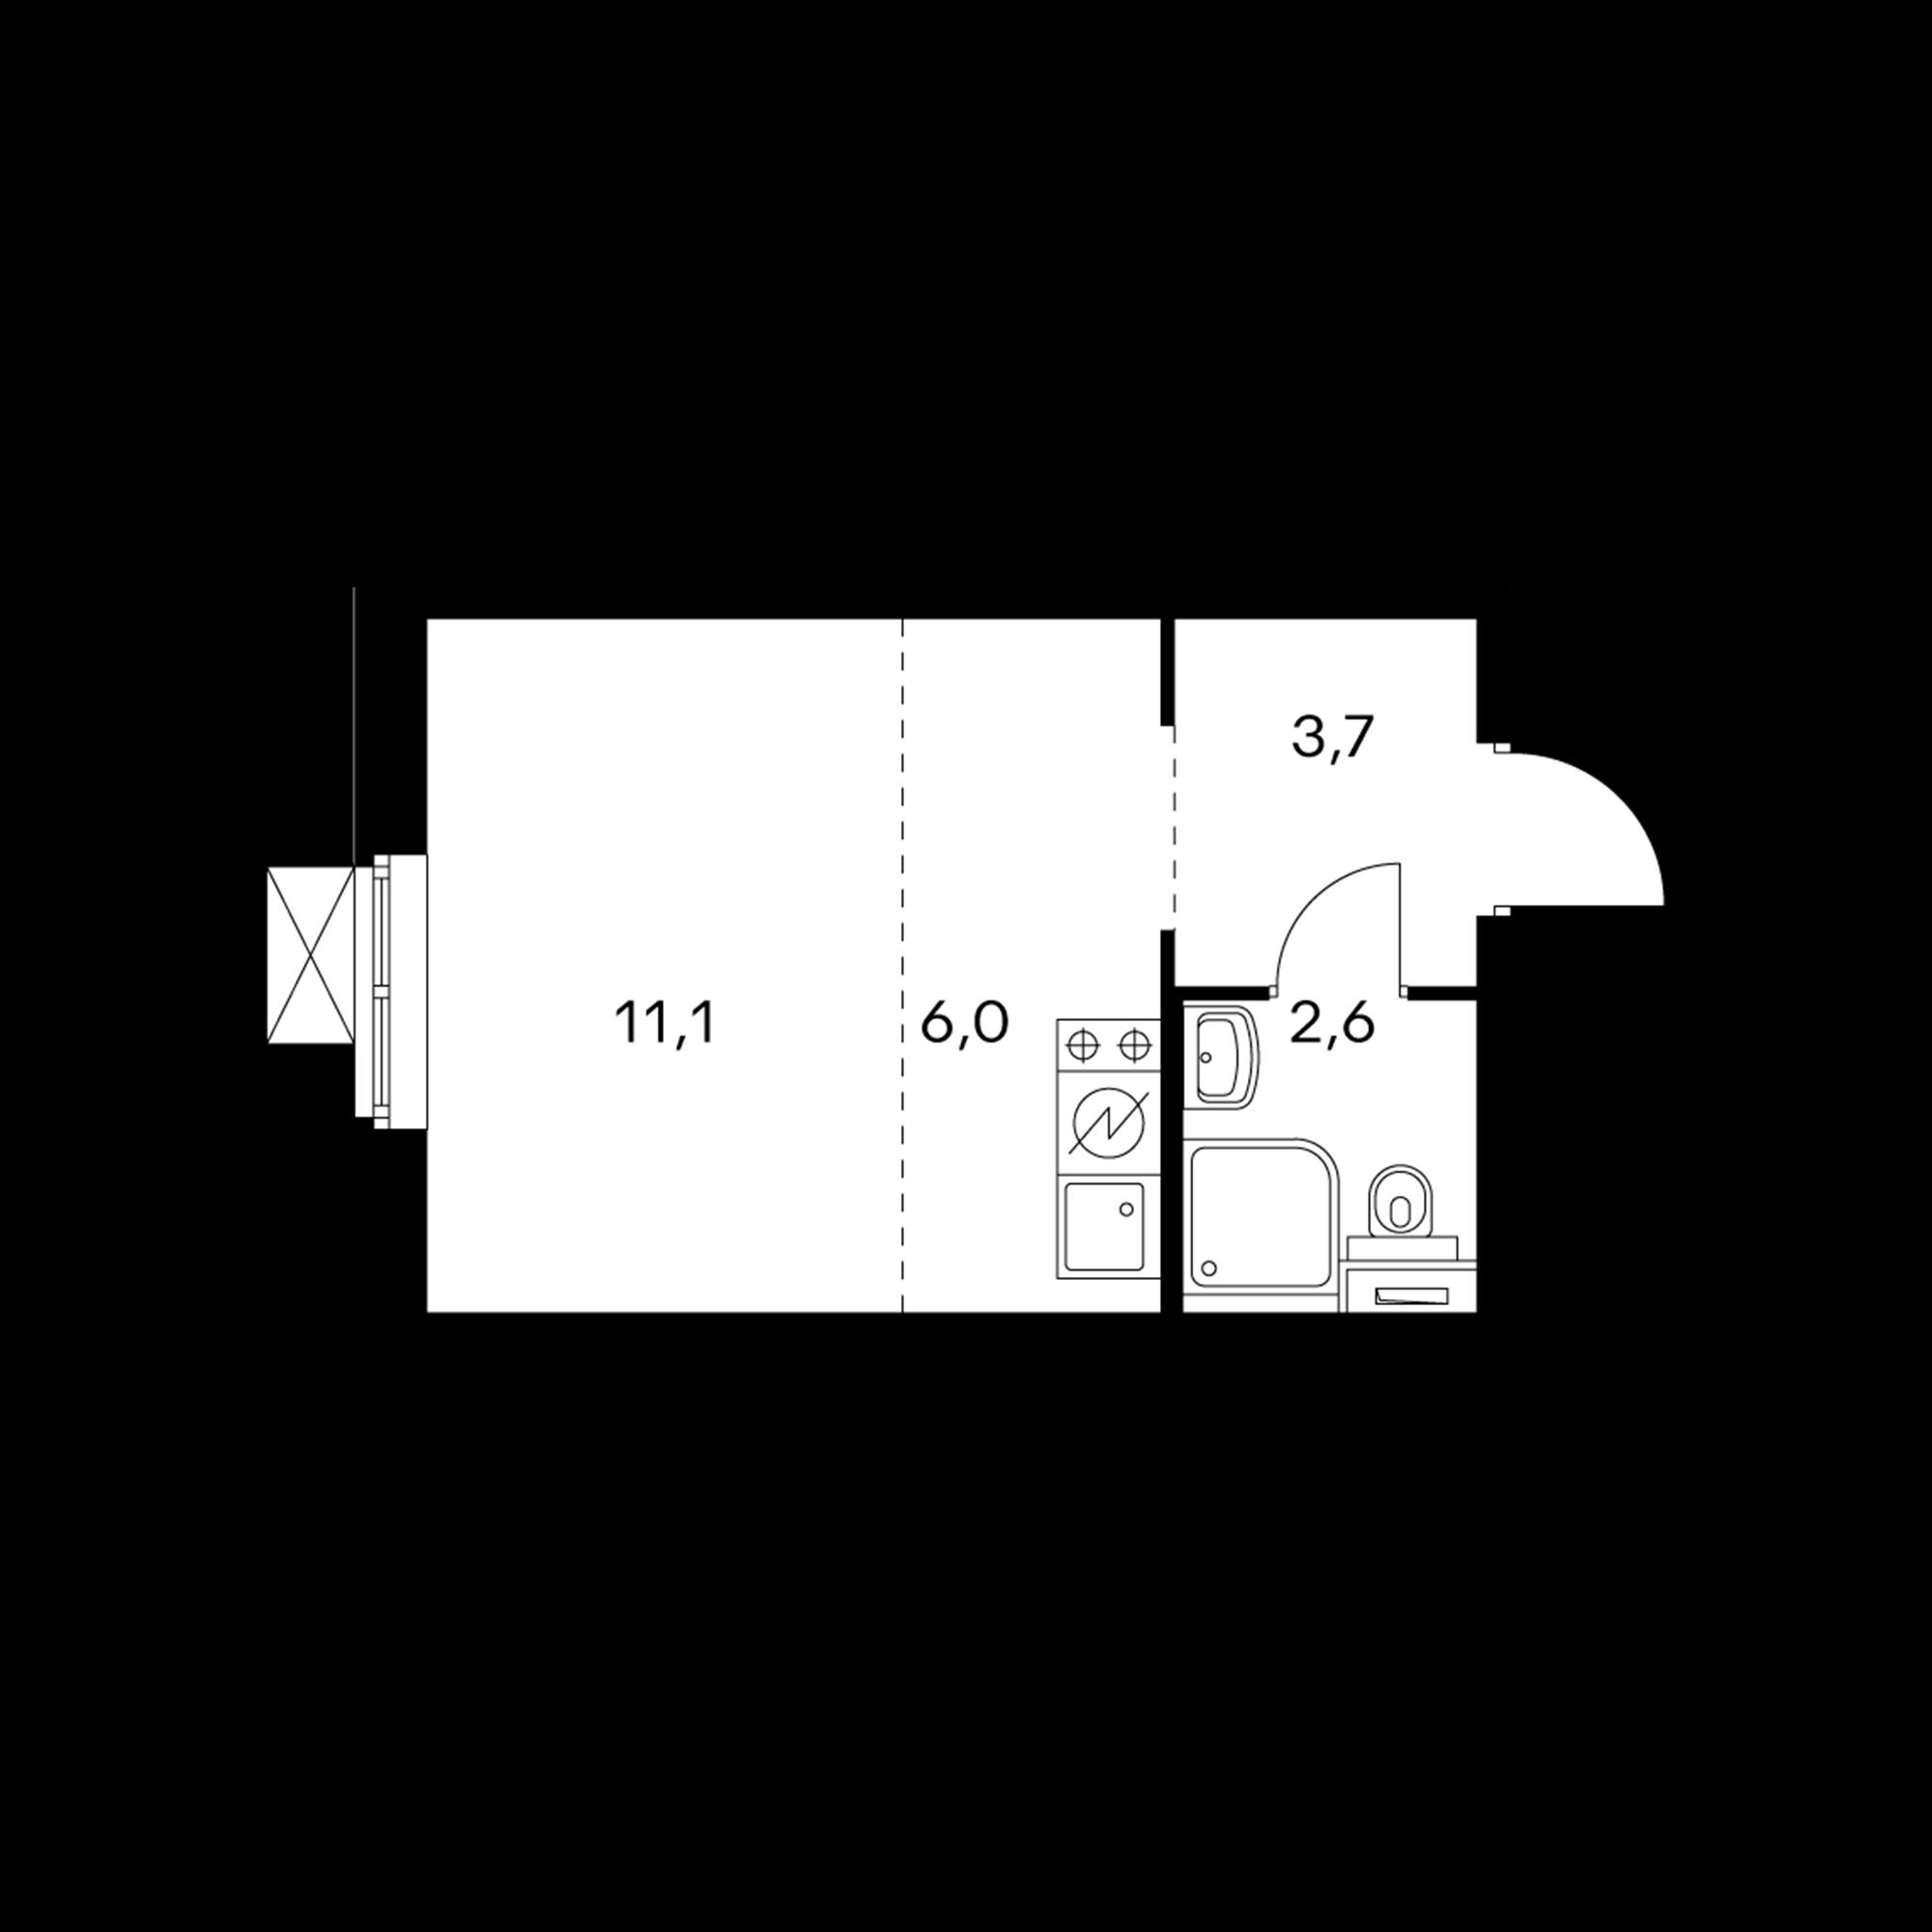 1NS1_4.2-1